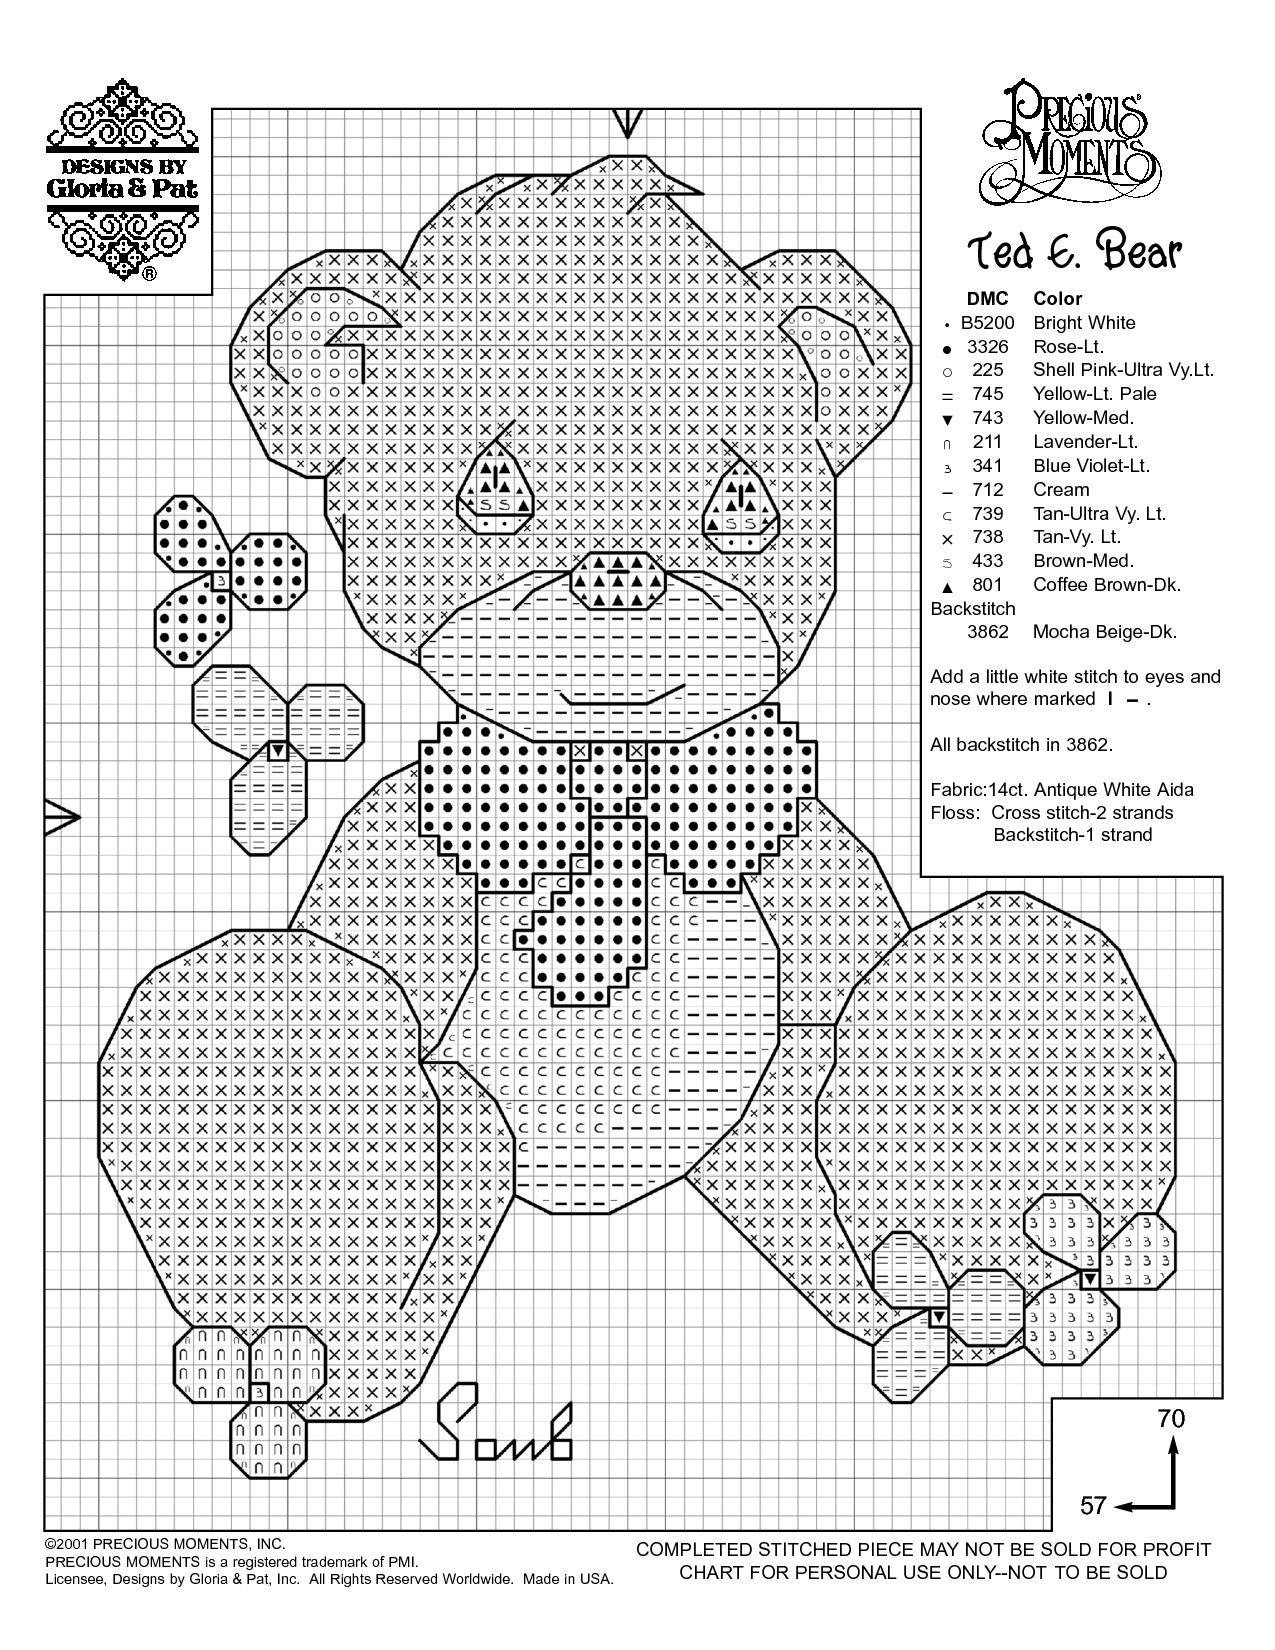 Pin by Eita on Babys C/S | Baby cross stitch patterns, Cross